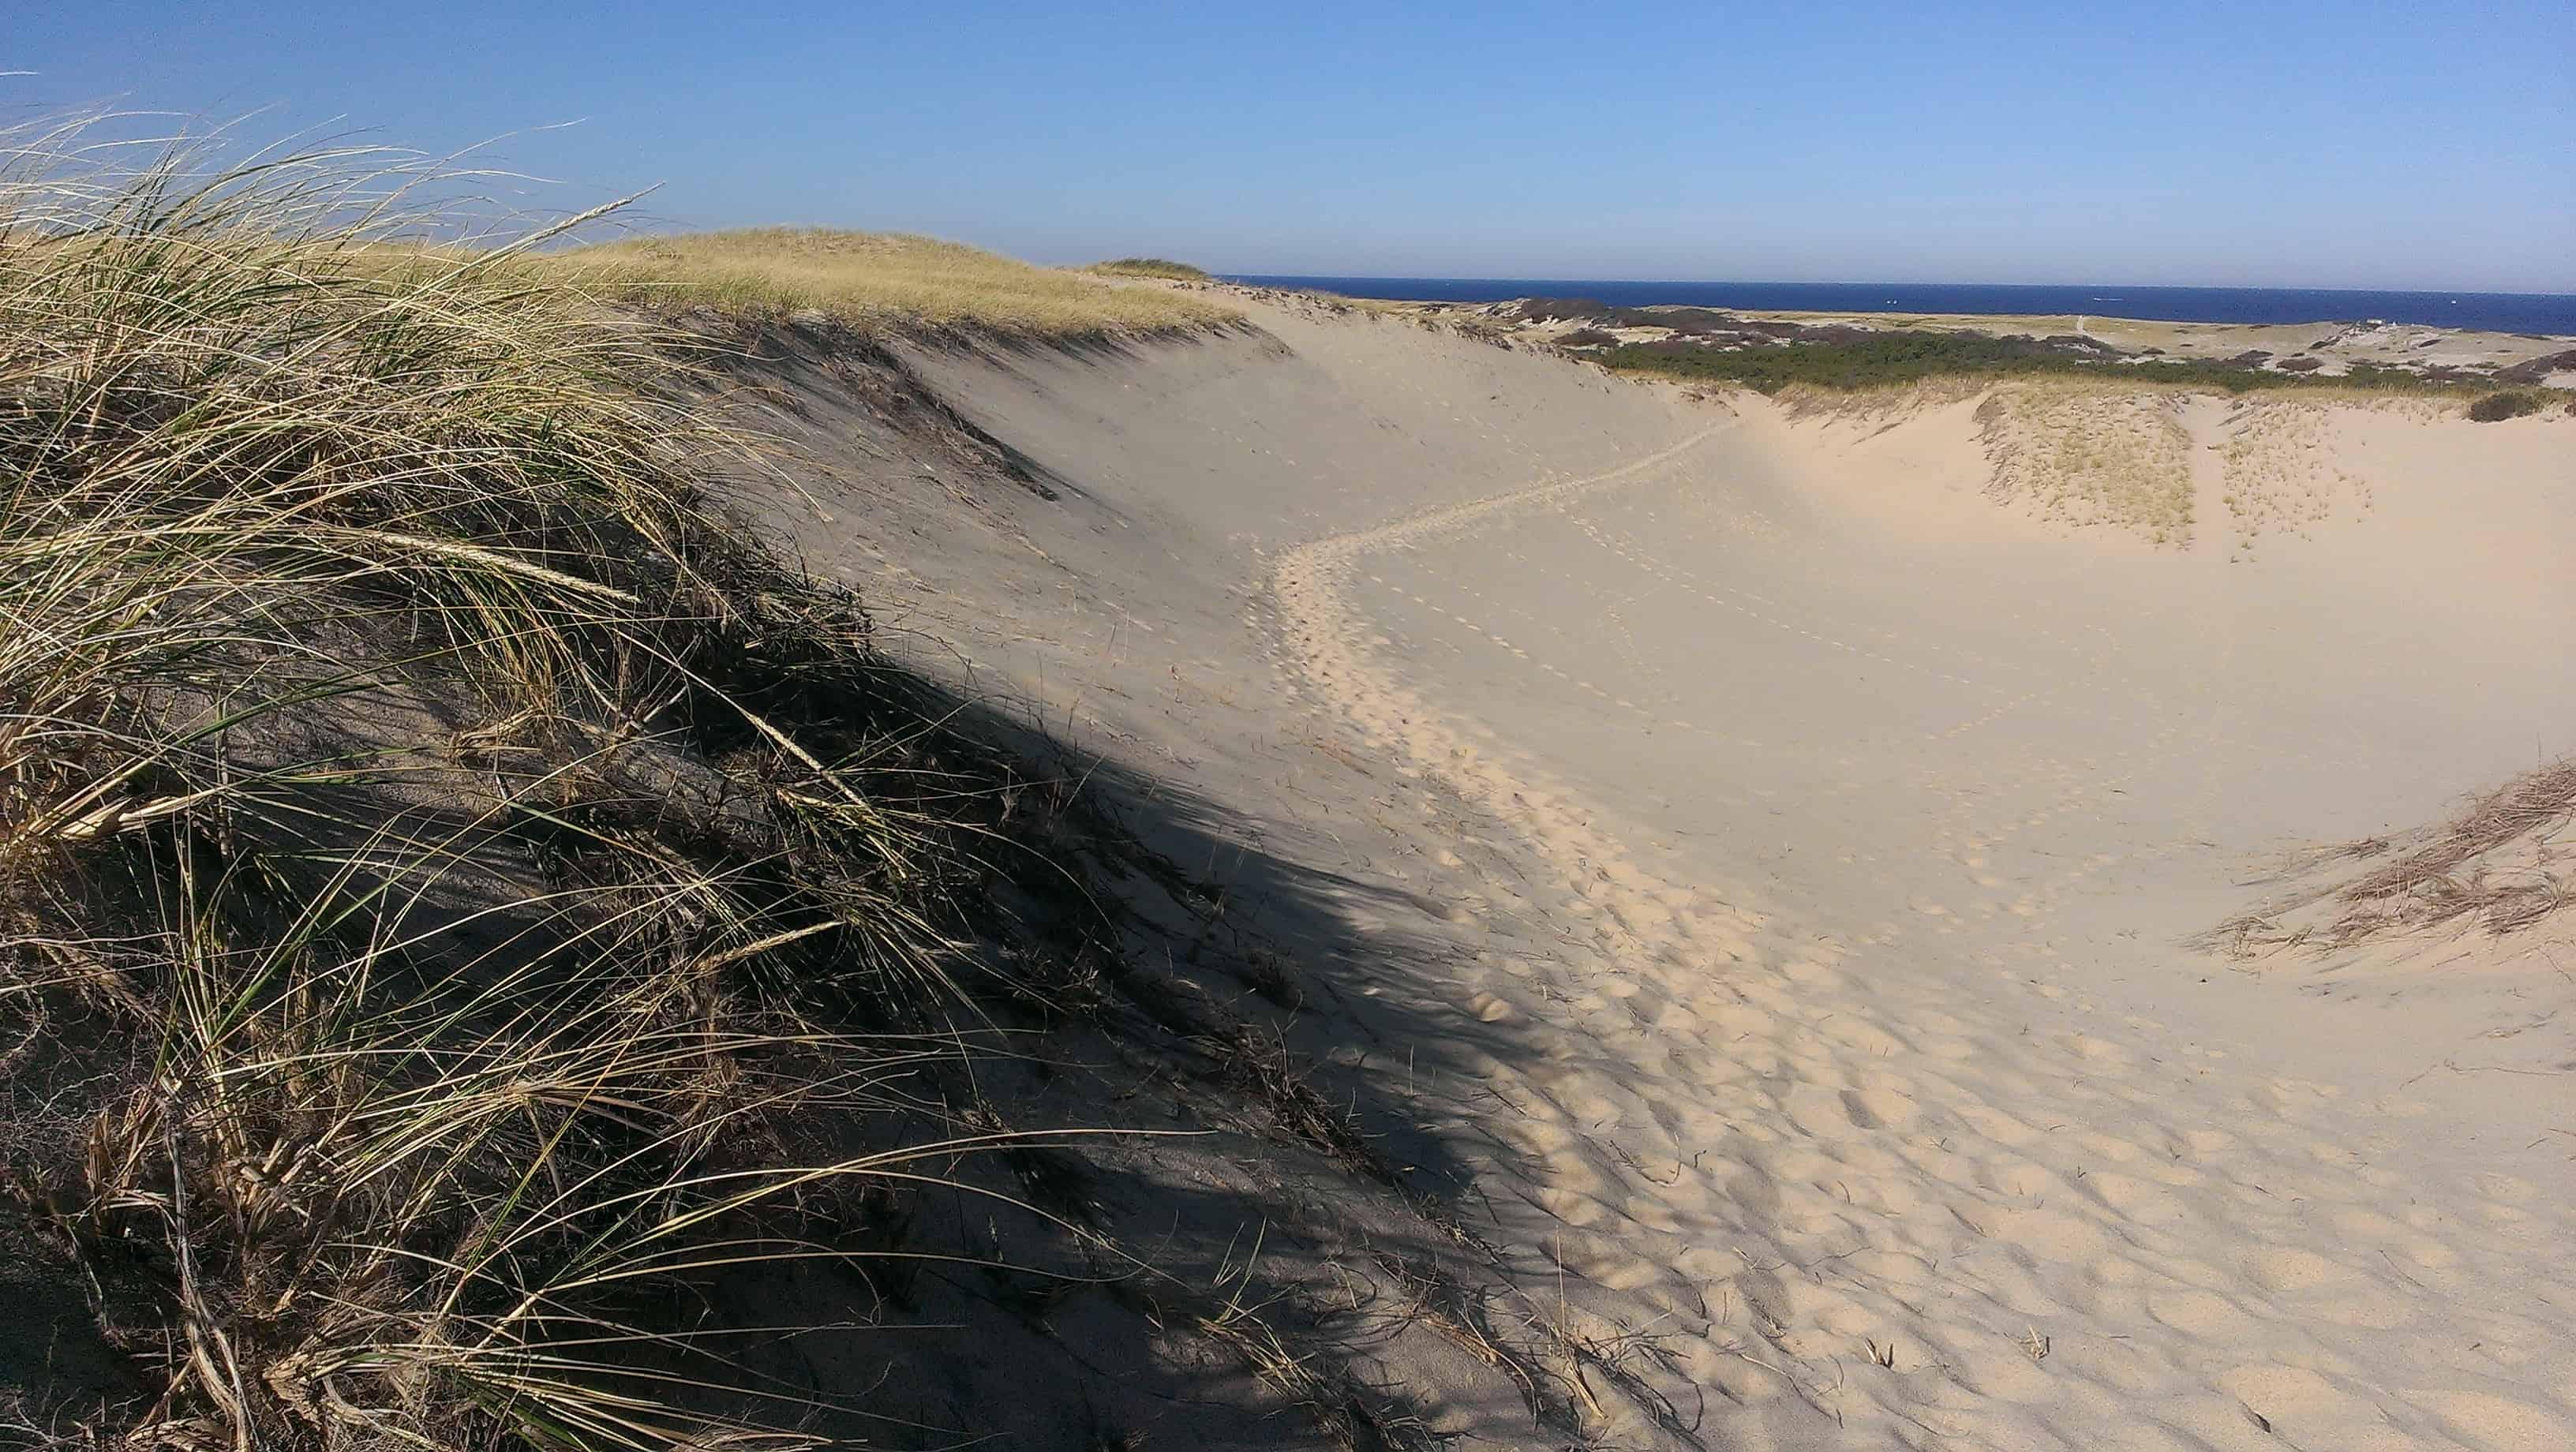 Dune Shacks Cape Cod Part - 24: Dune Shacks